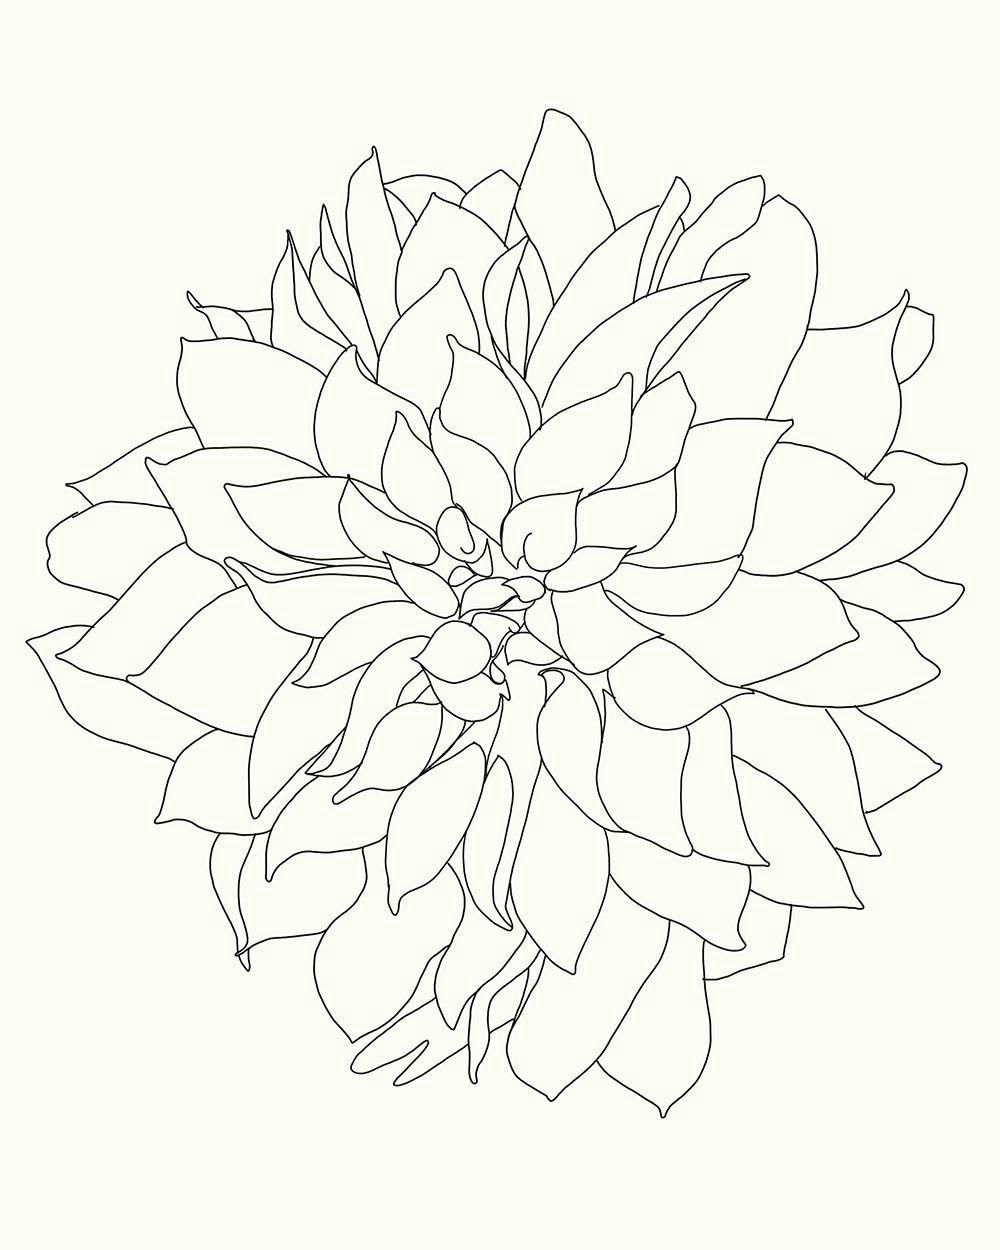 Drawing Of Dahlia Flowers Dahlia Art Pinterest Art Prints Art and Fine Art Prints